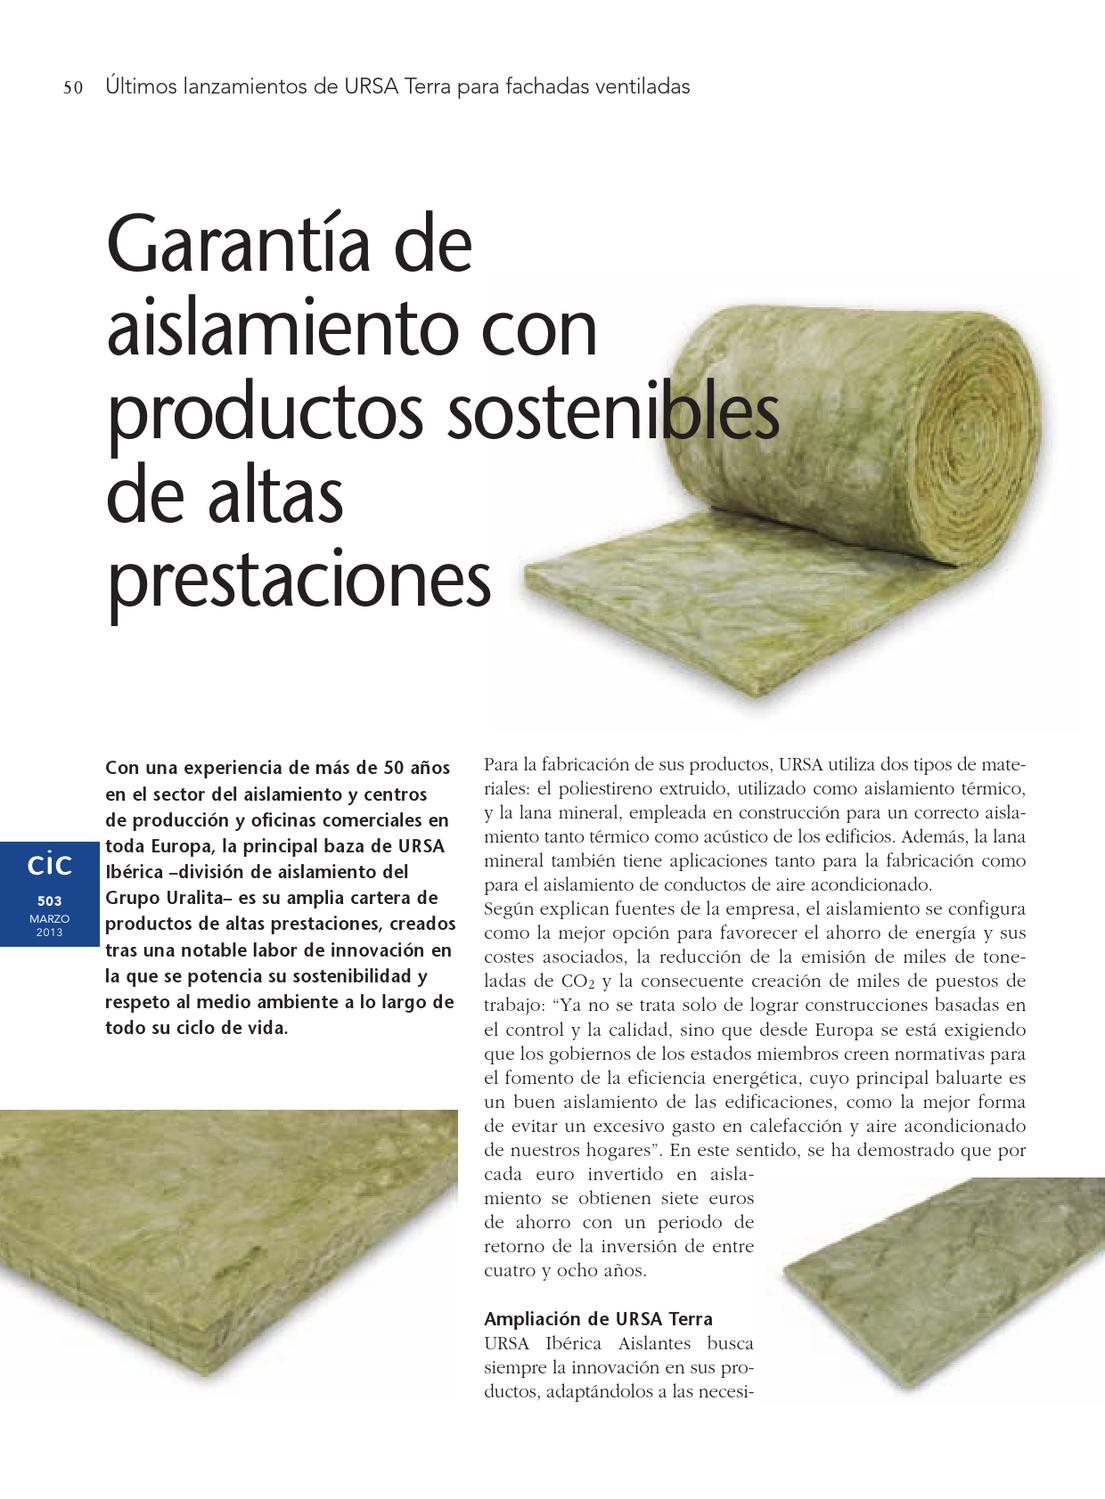 36d7fcea74 CICArquitectura-503 by Versys Ediciones Técnicas, S.L. - issuu